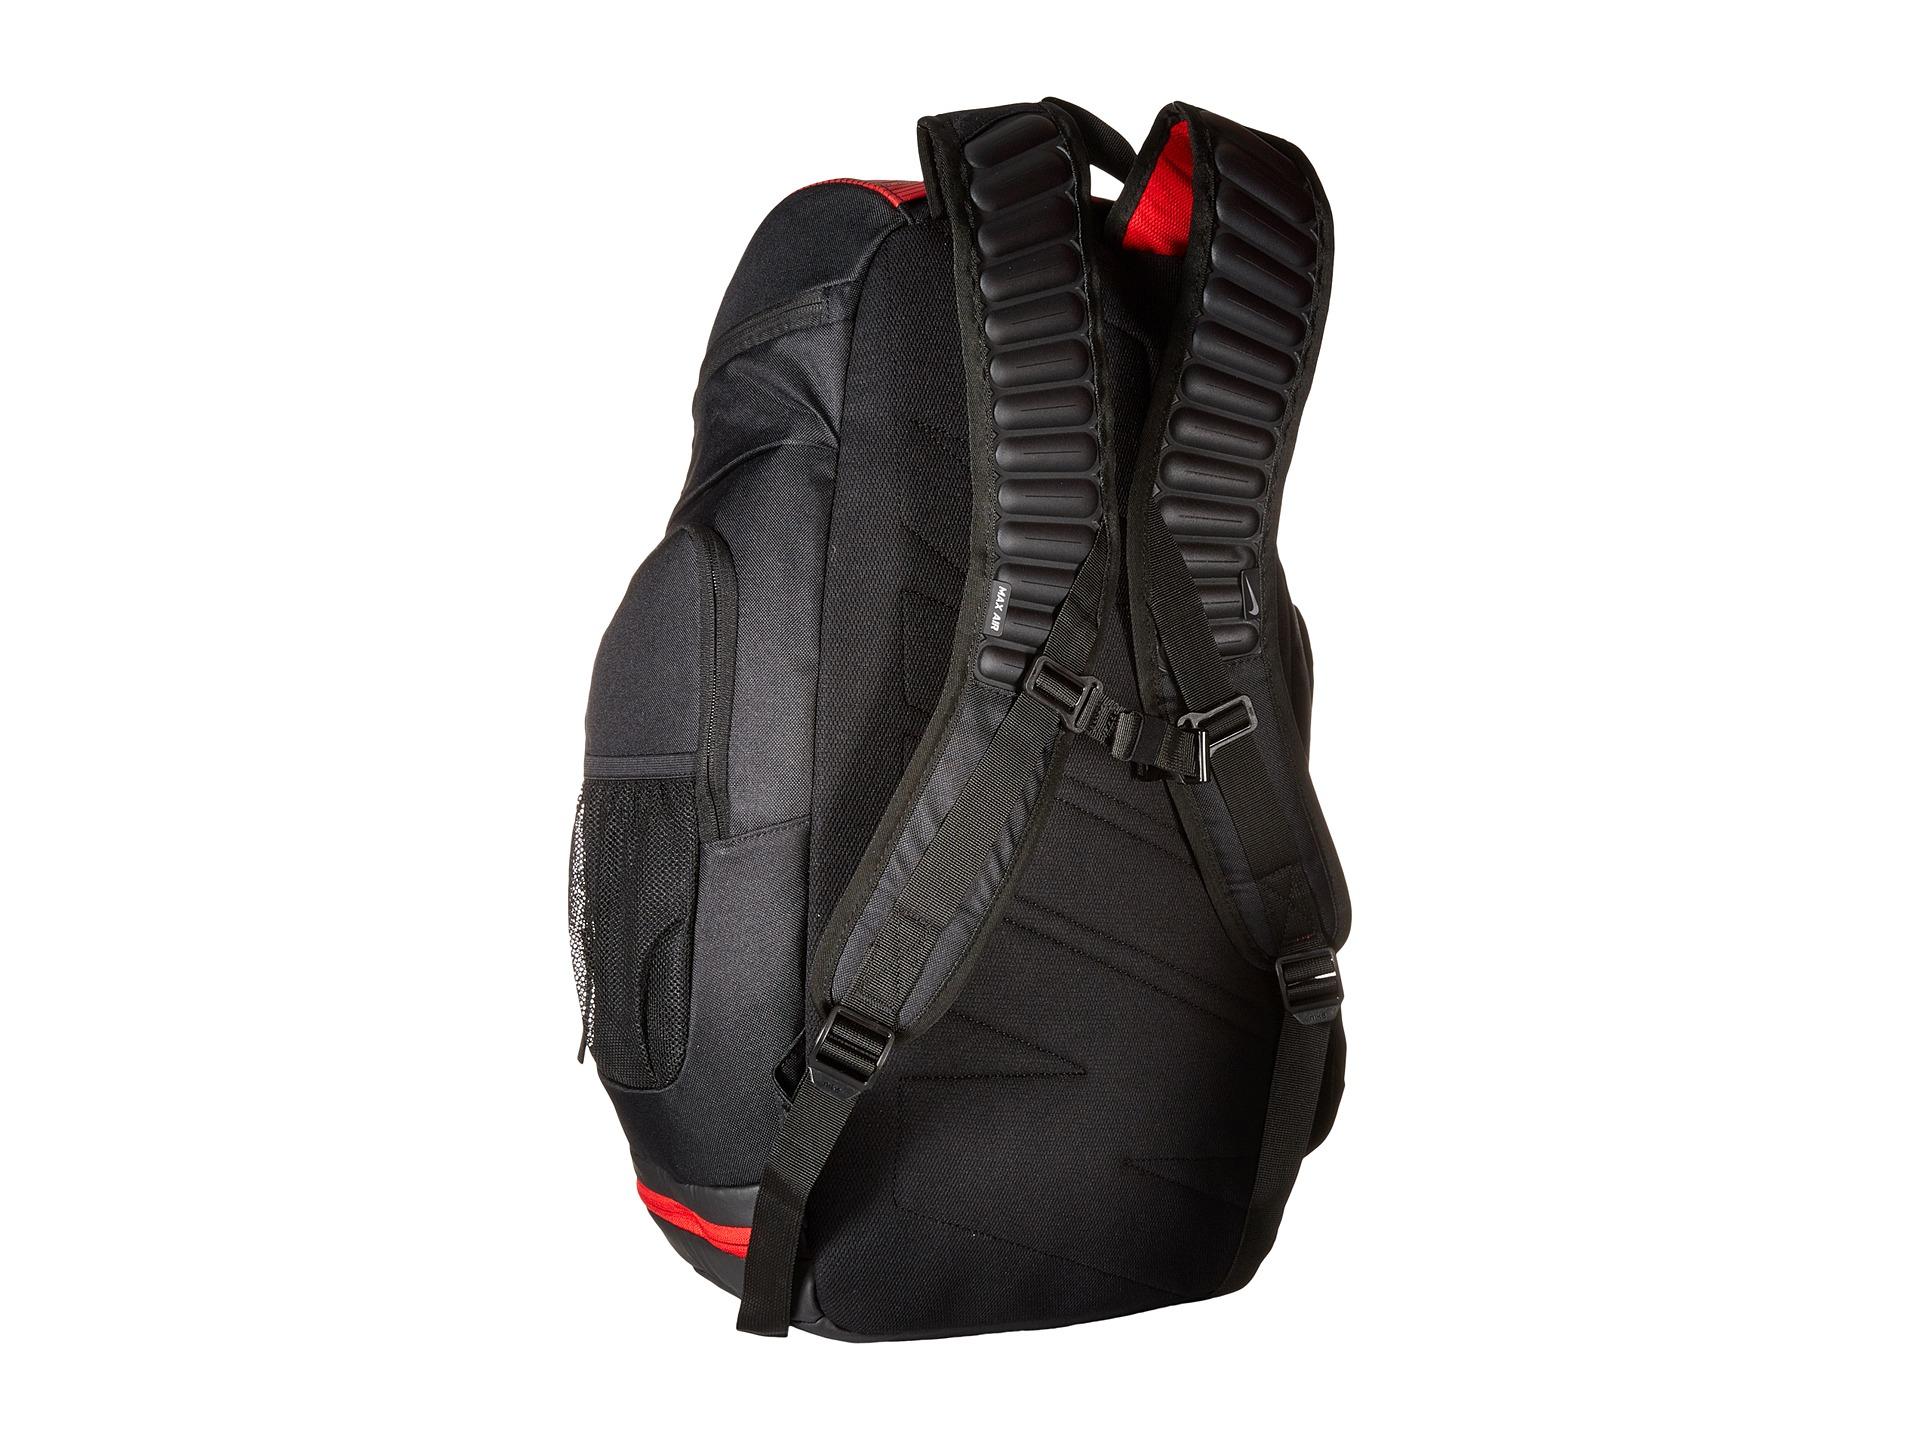 Lyst - Nike Hoops Elite Max Air Backpack Gr in Red a80bb3514